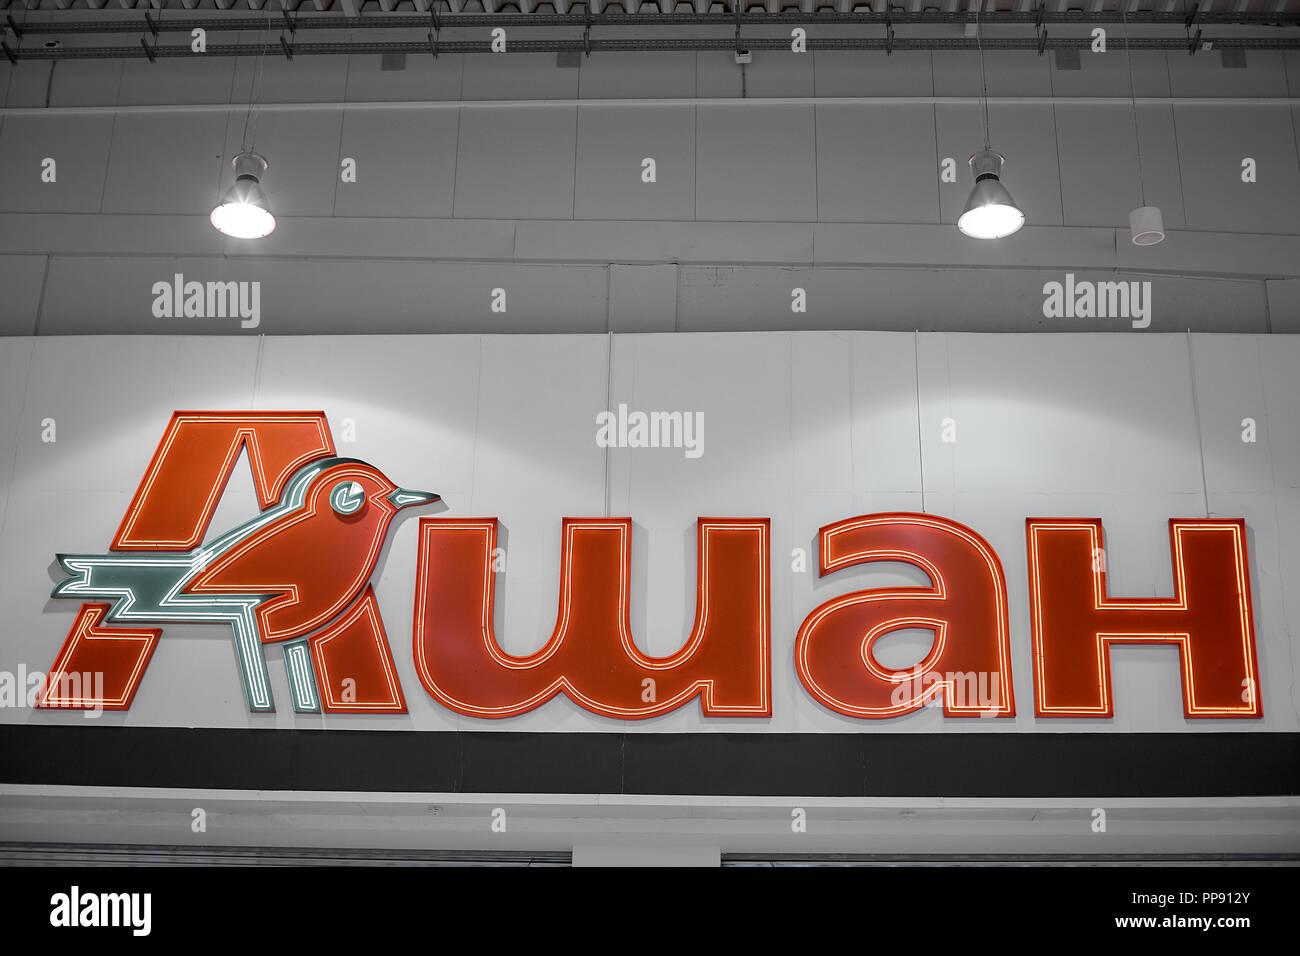 SAMARA, RUSSIA - NOVEMBER 15, 2017: Logo of shopping Center Auchan hypermarket. French distribution network Auchan Stock Photo